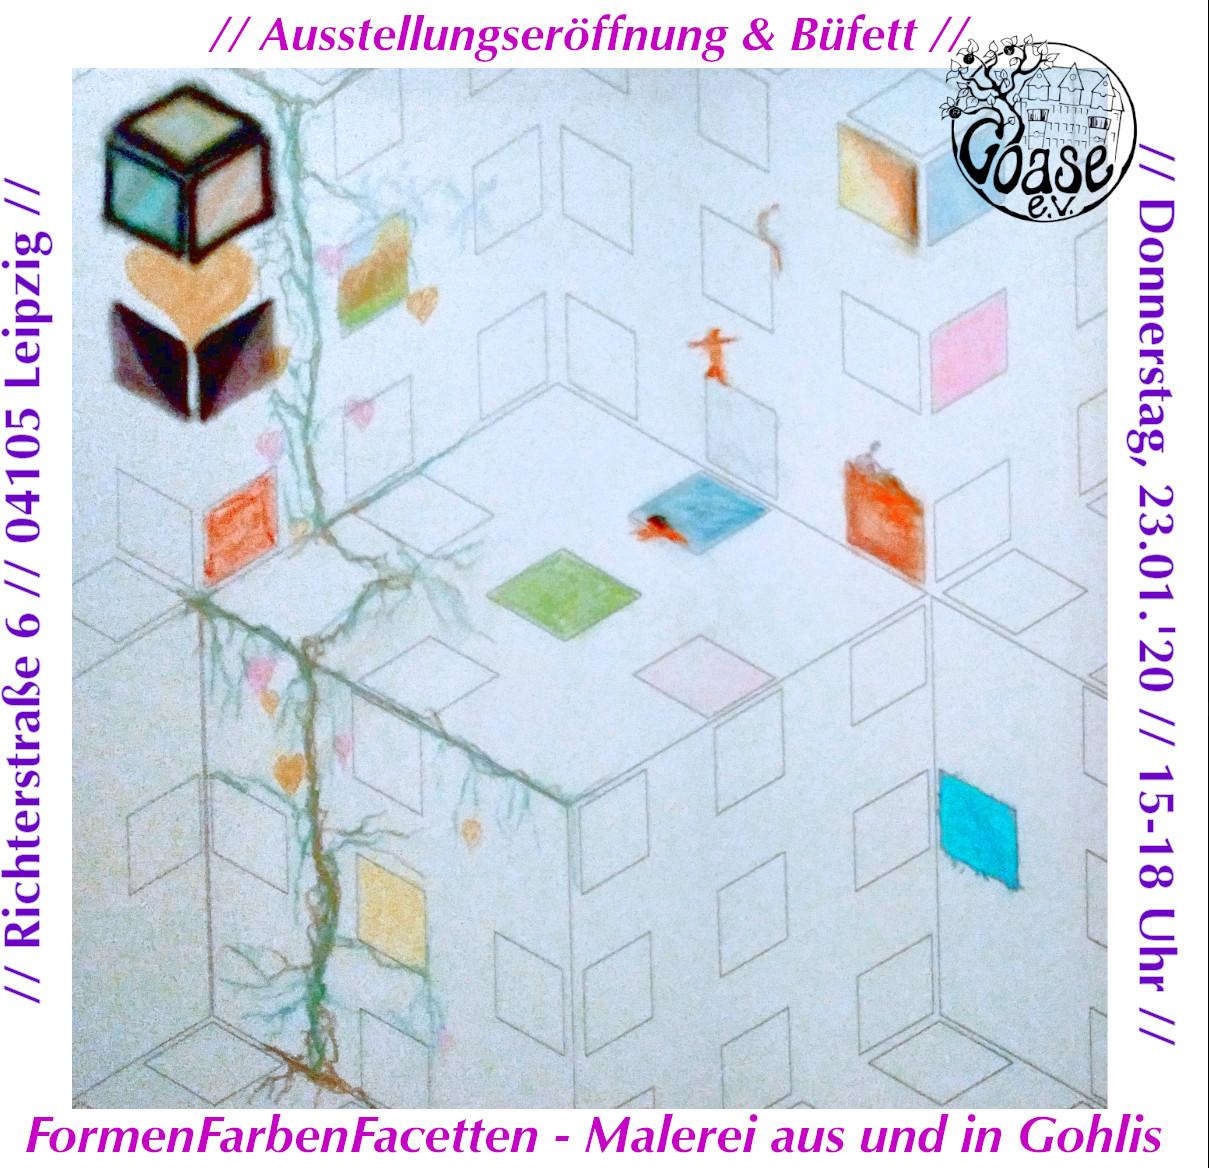 Flyer_Ausstellung_FFF2020